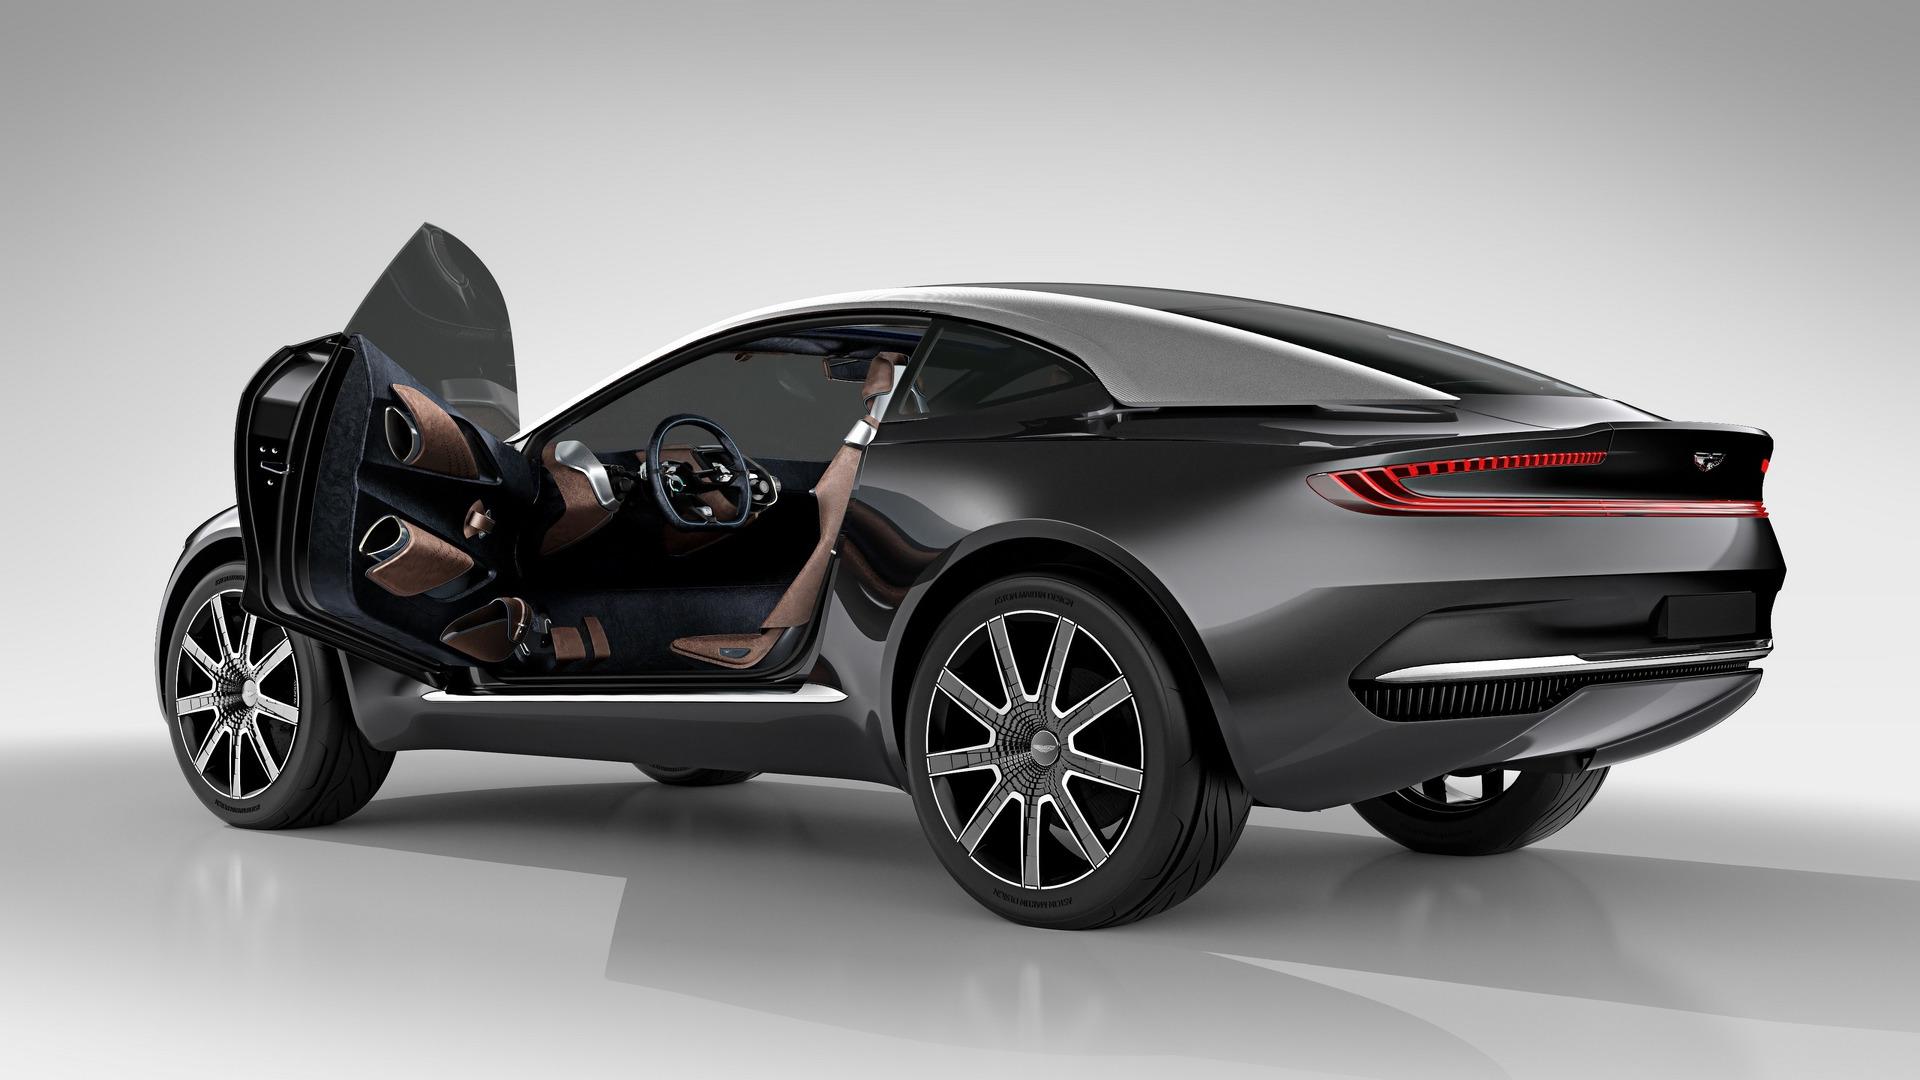 Aston Martin Suv Could Be Called Varekai